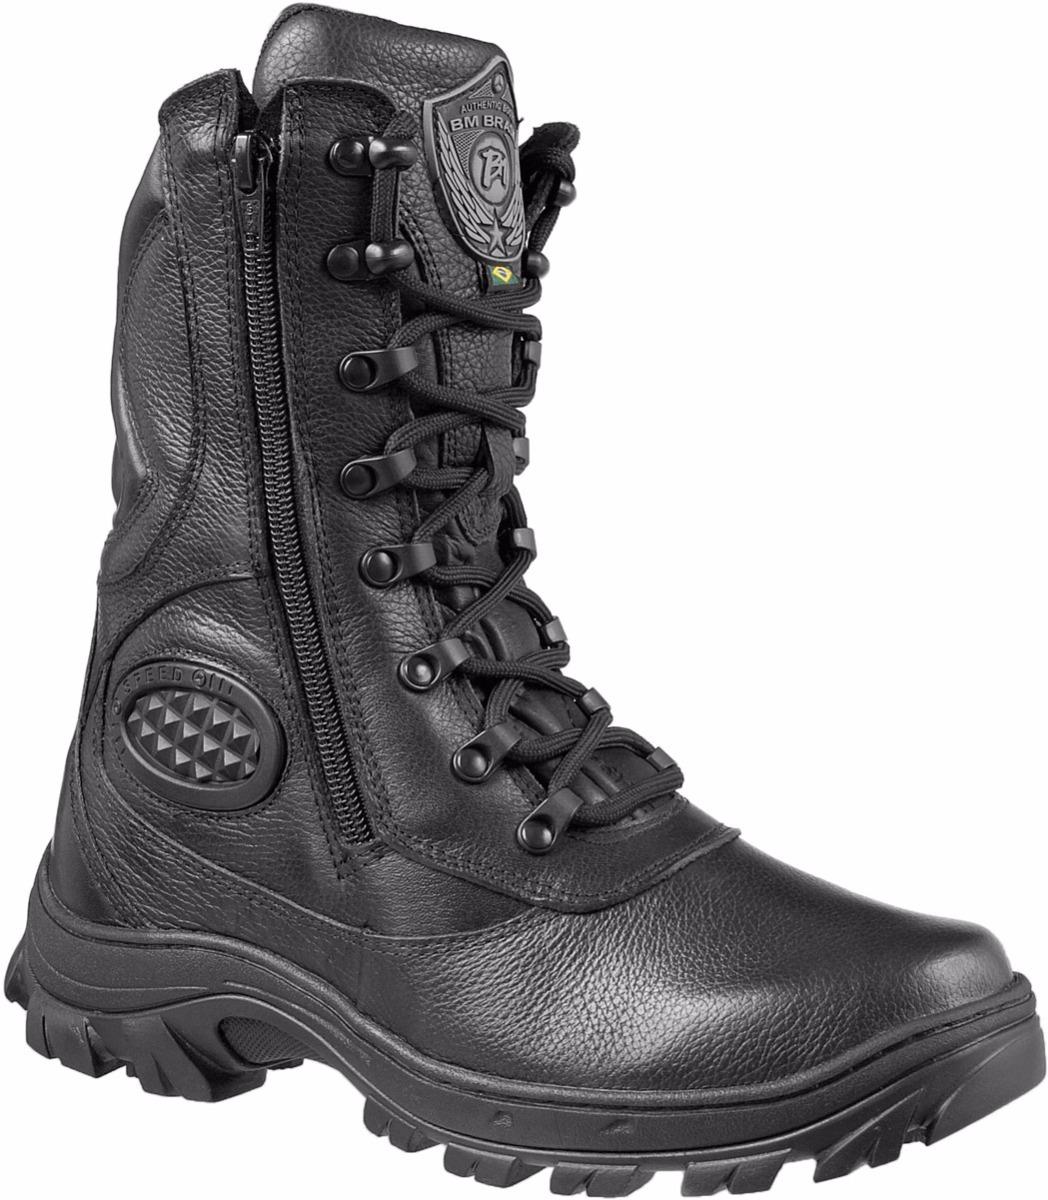 d6fcae51f Coturno Militar Botas Unissex Confortável 5179 - R$ 208,00 em ...